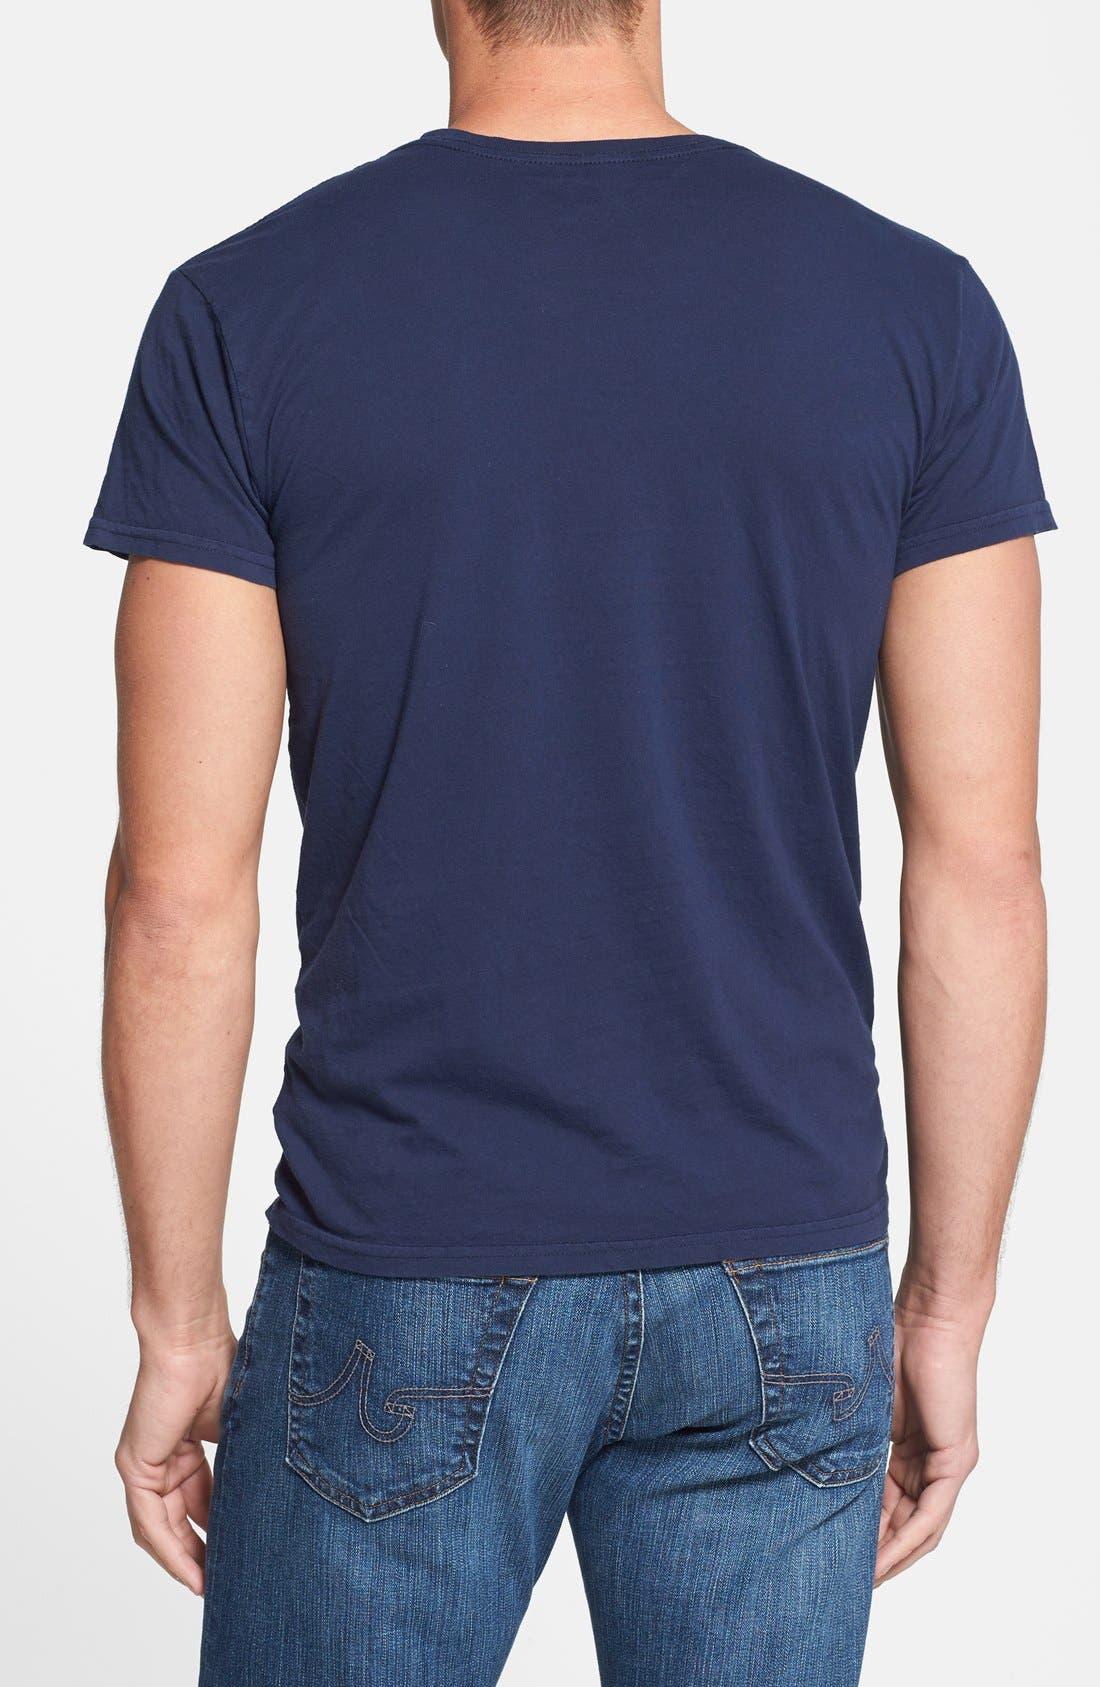 Alternate Image 2  - Retro Brand 'USA Soccer' Slim Fit T-Shirt